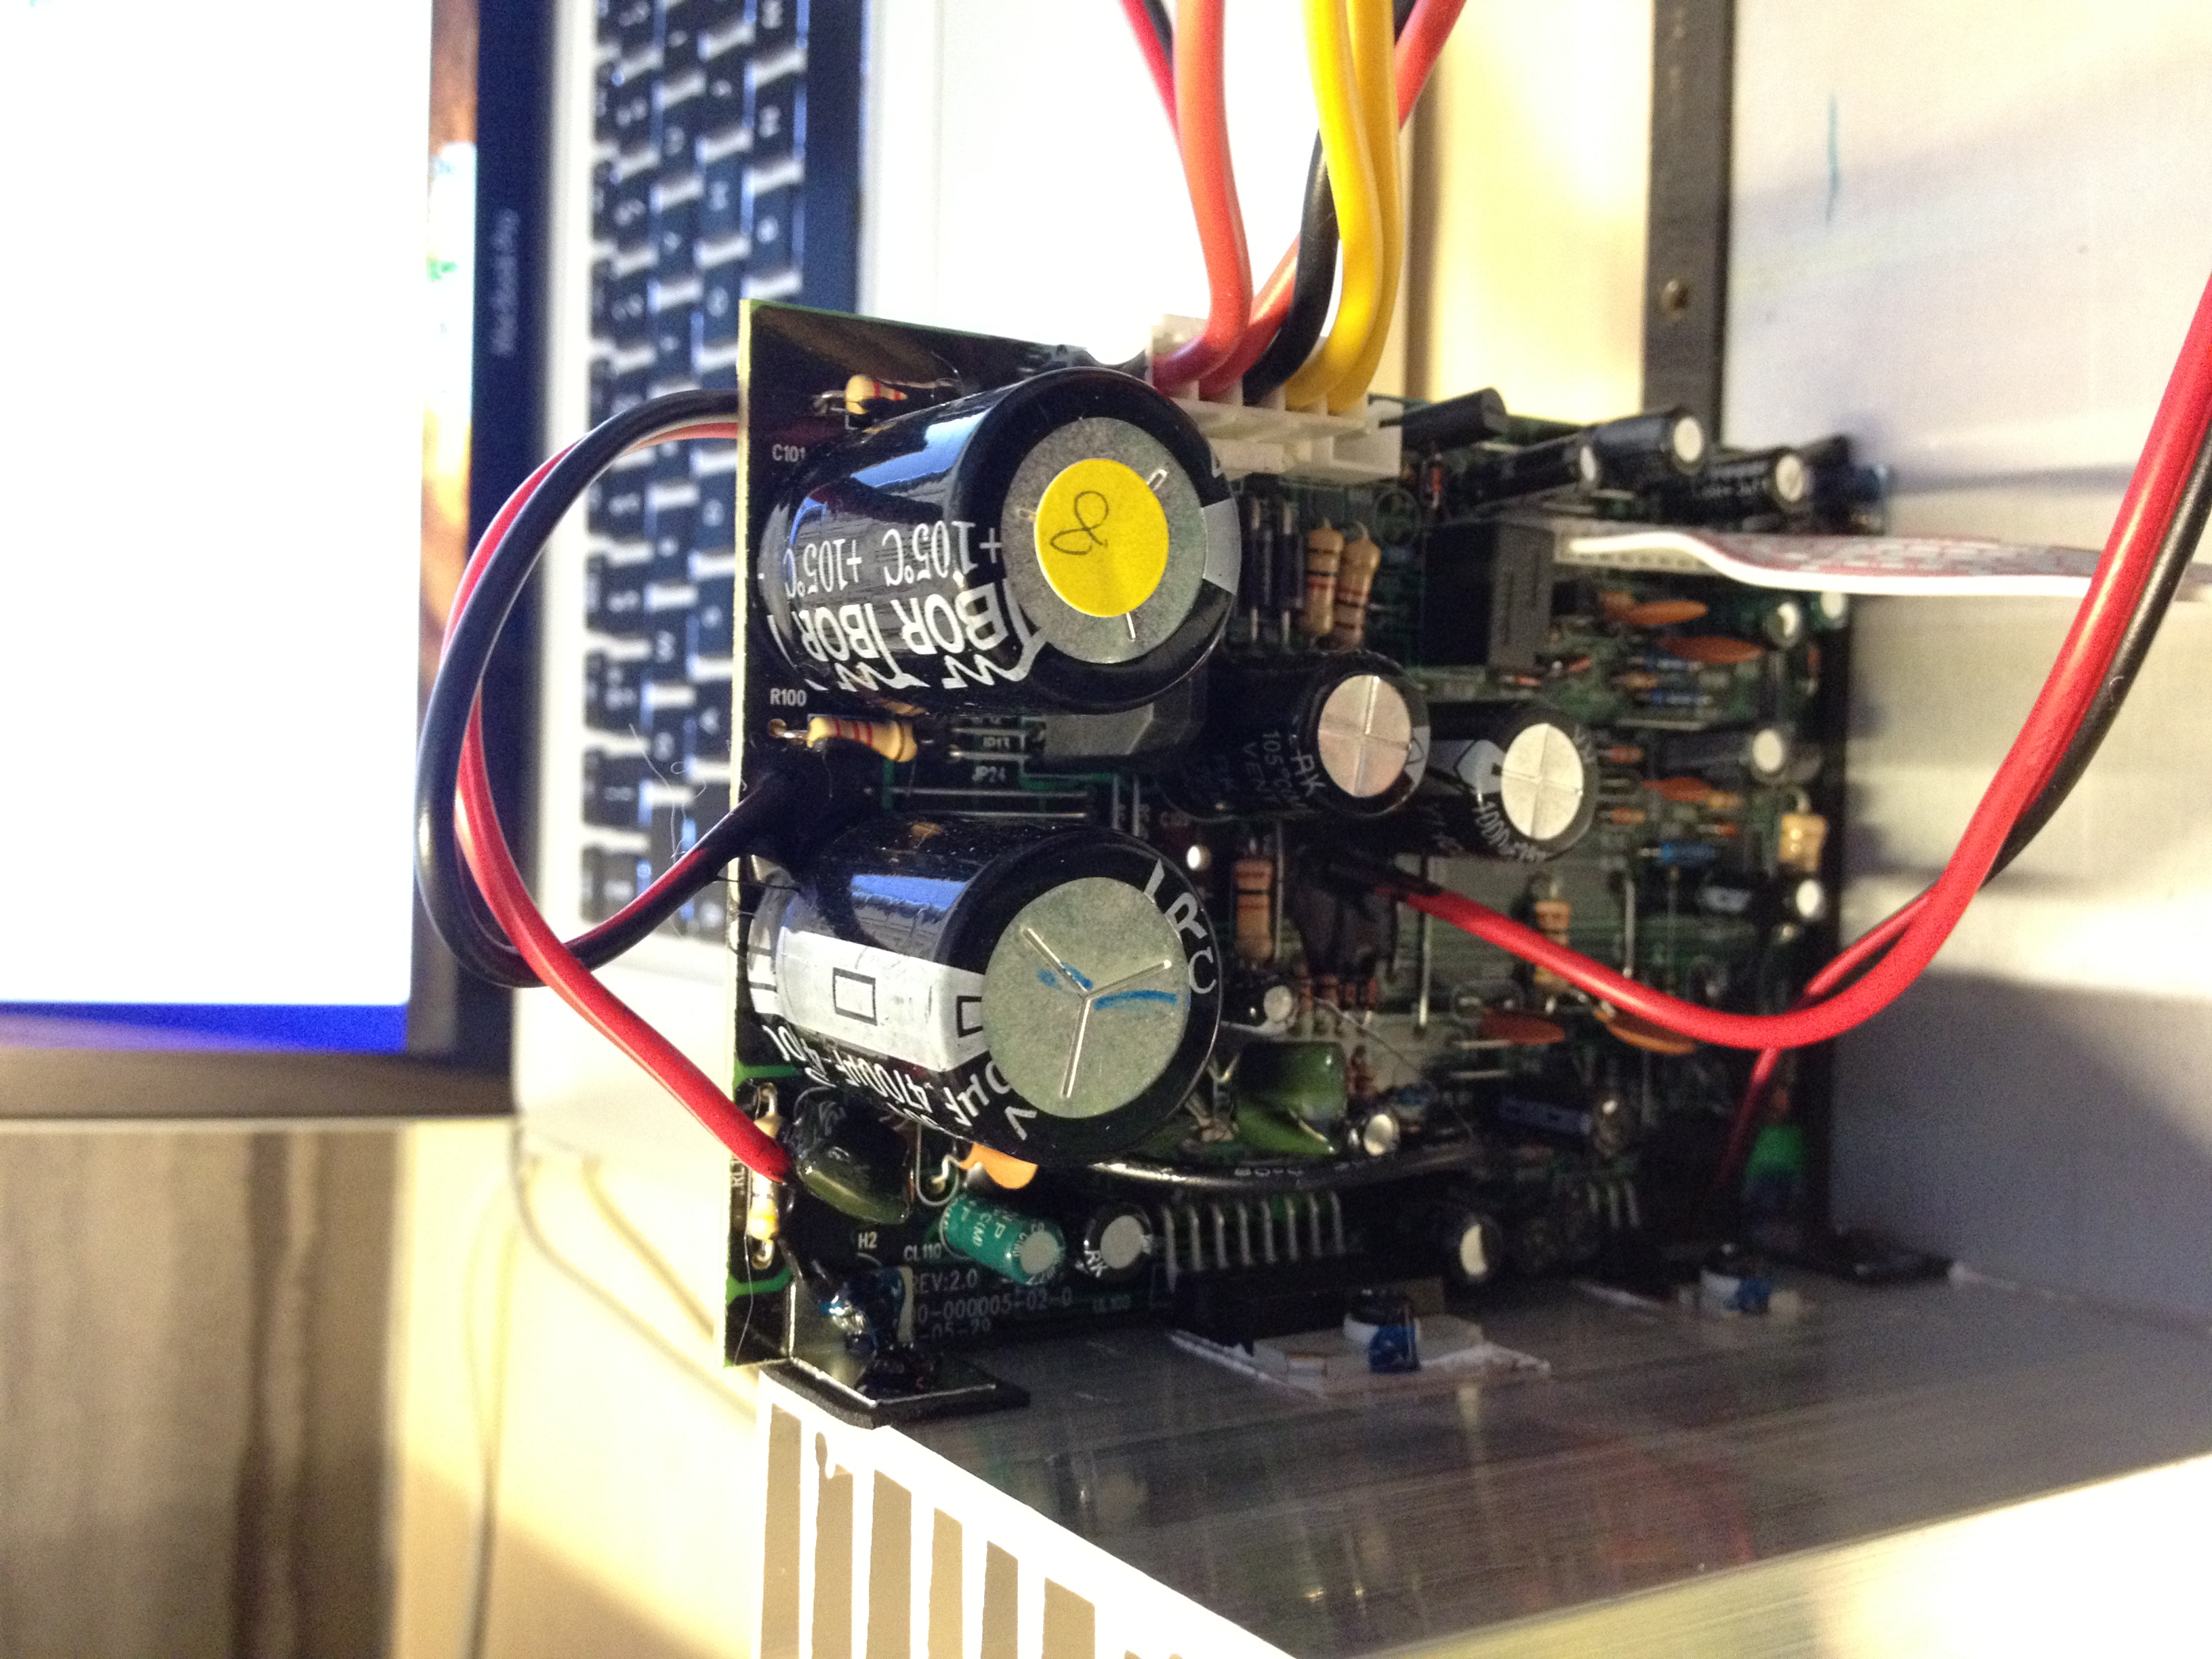 303010d1343669457 krk rokit rp8 g2 hf amp repair img_0574 krk rokit rp8 g2 hf amp repair gearslutz pro audio community KRK Rokit 8 at bayanpartner.co